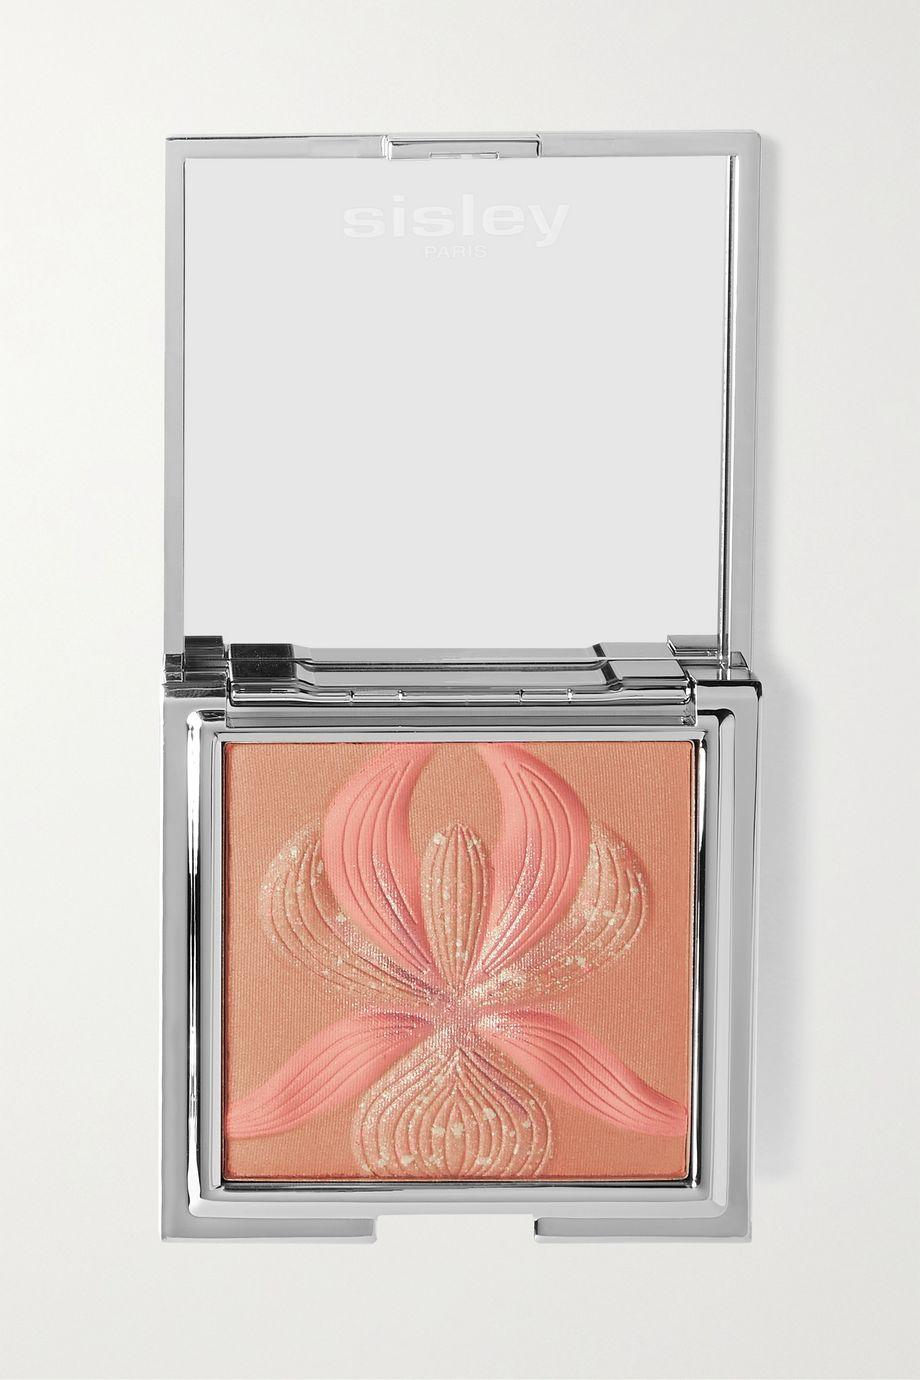 Sisley Highlighter Blush - L'Orchidée